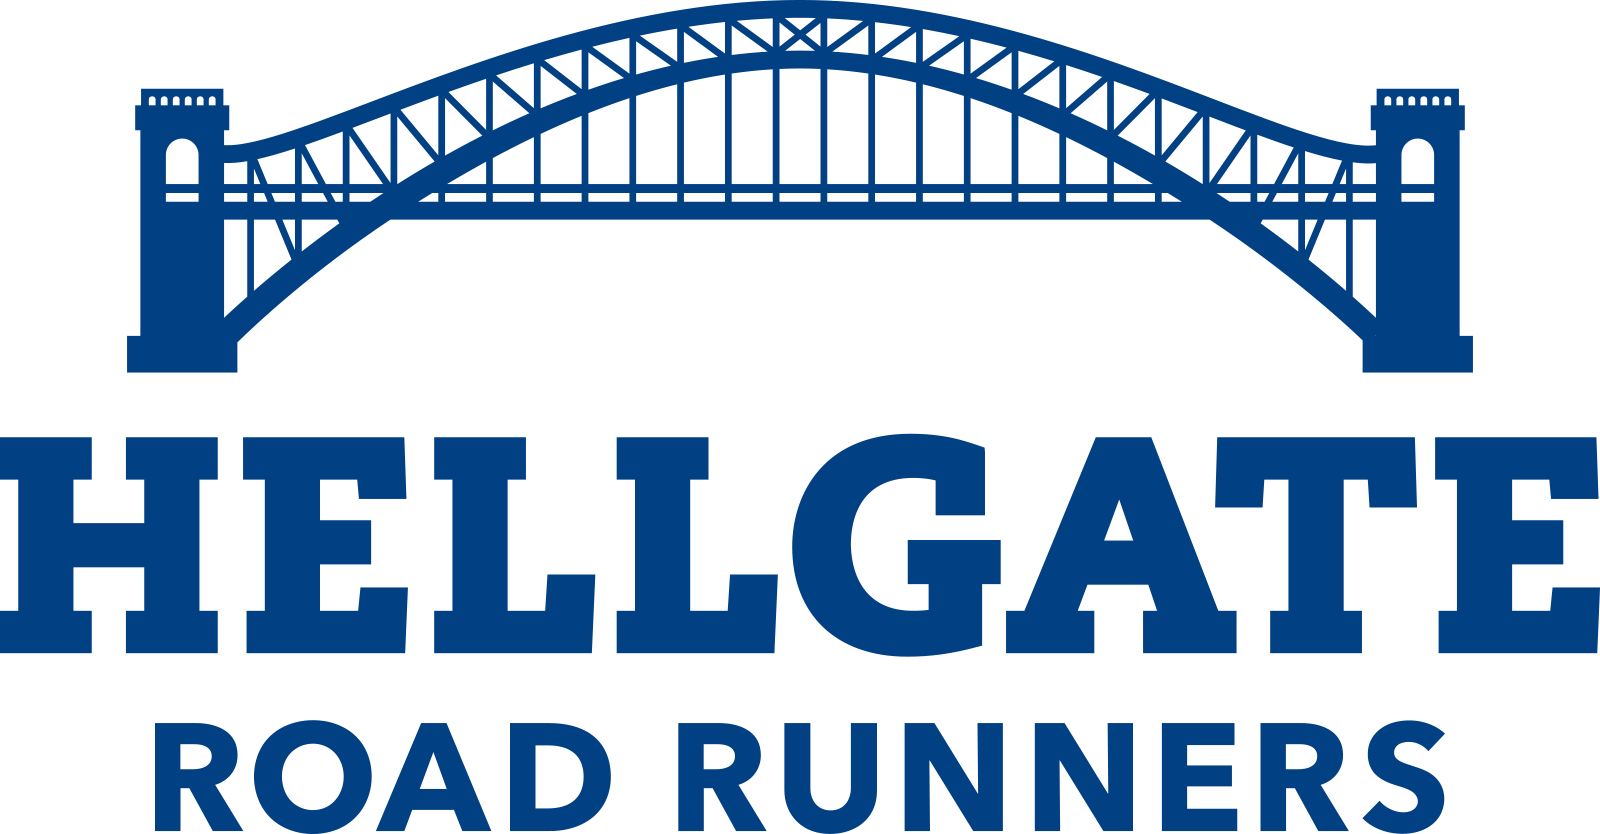 the-hellgate-100-years-5k-fun-run-sponsor